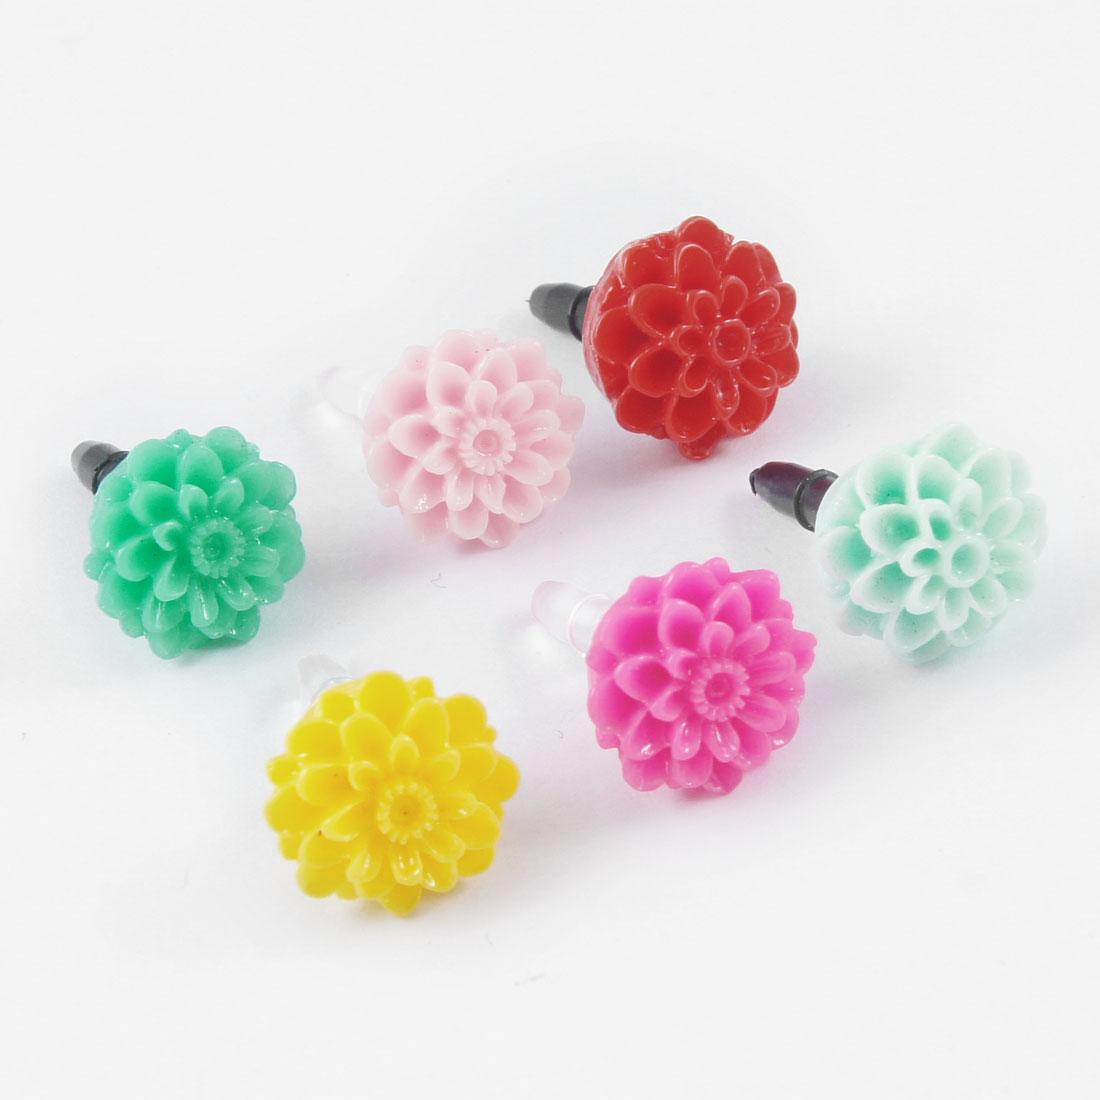 6 Pcs Colored Flowers Decor Anti Dust 3.5mm Earphone Jack Stopper